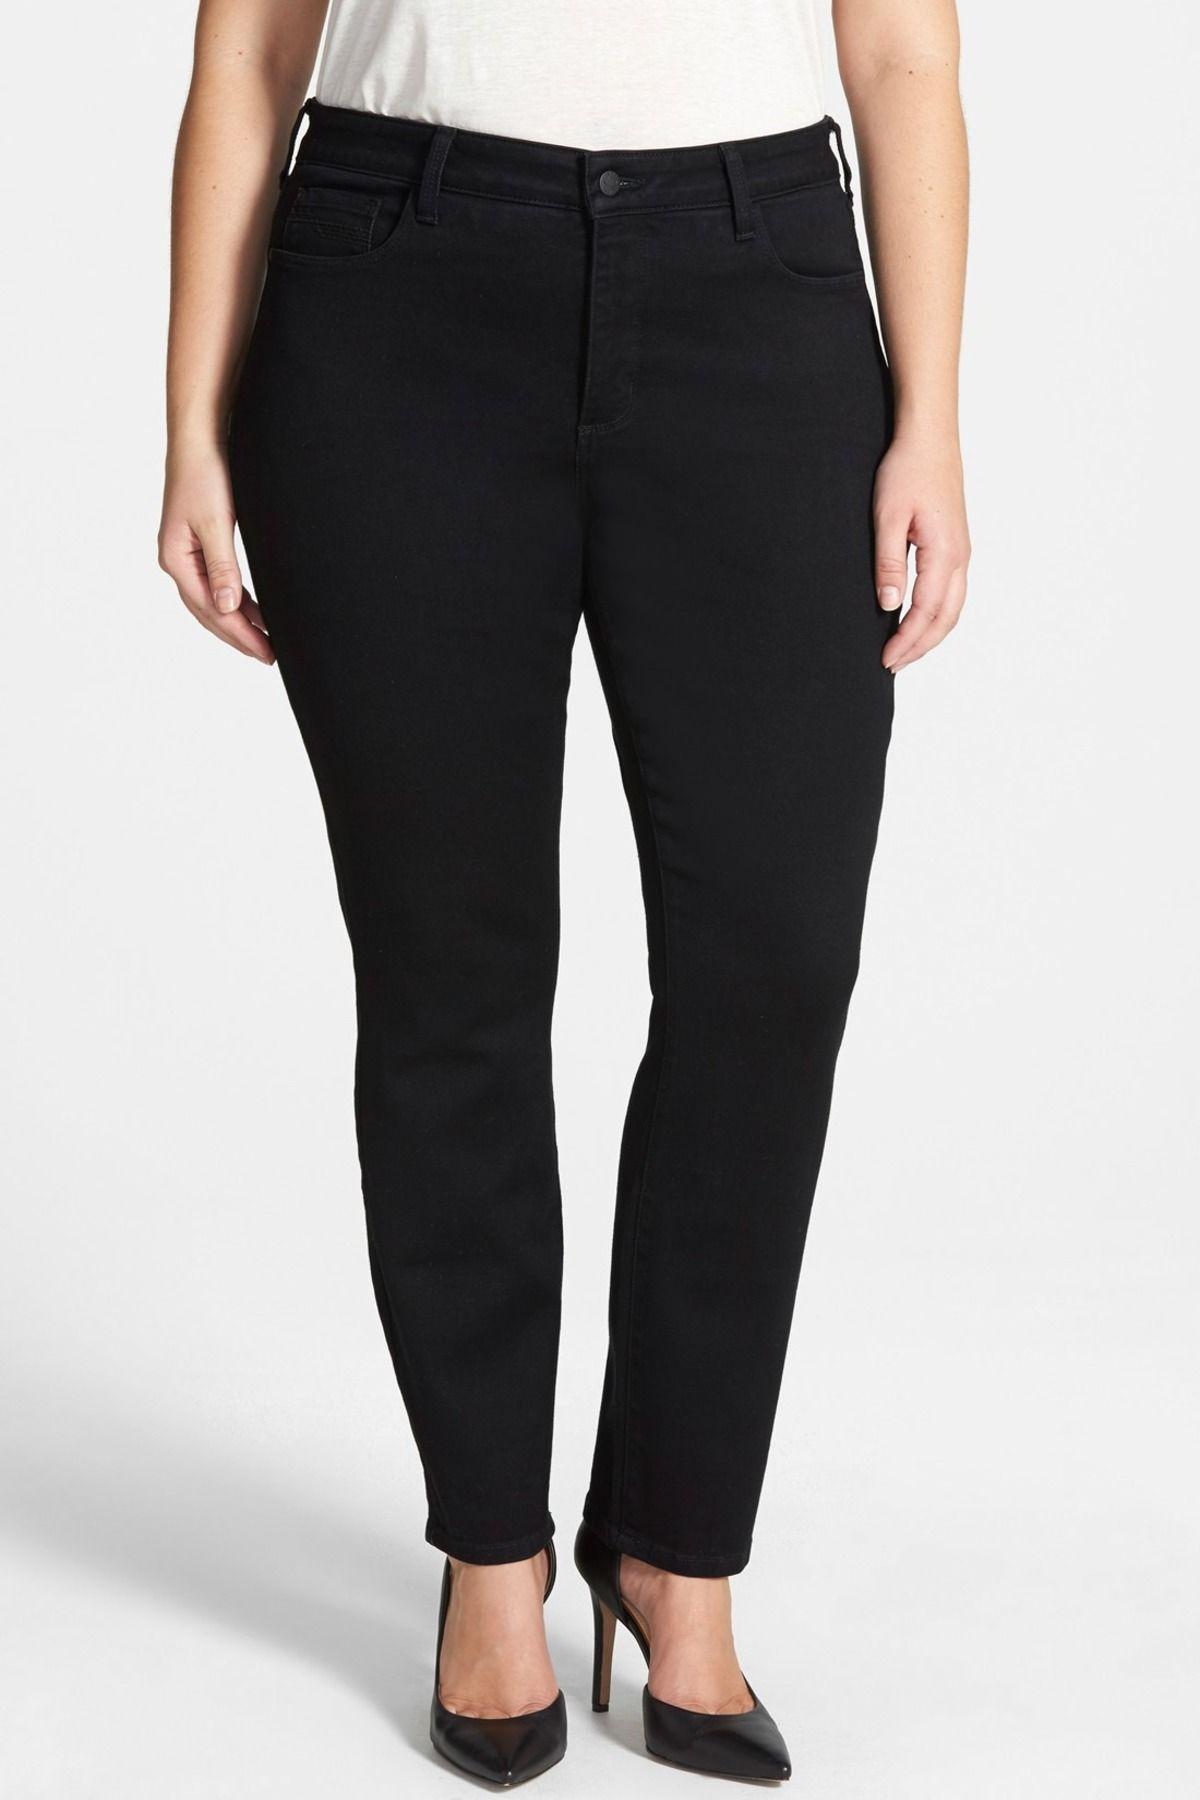 bb70c66d997 Jade Stretch Skinny Jean (Plus Size) by NYDJ on  nordstrom rack ...